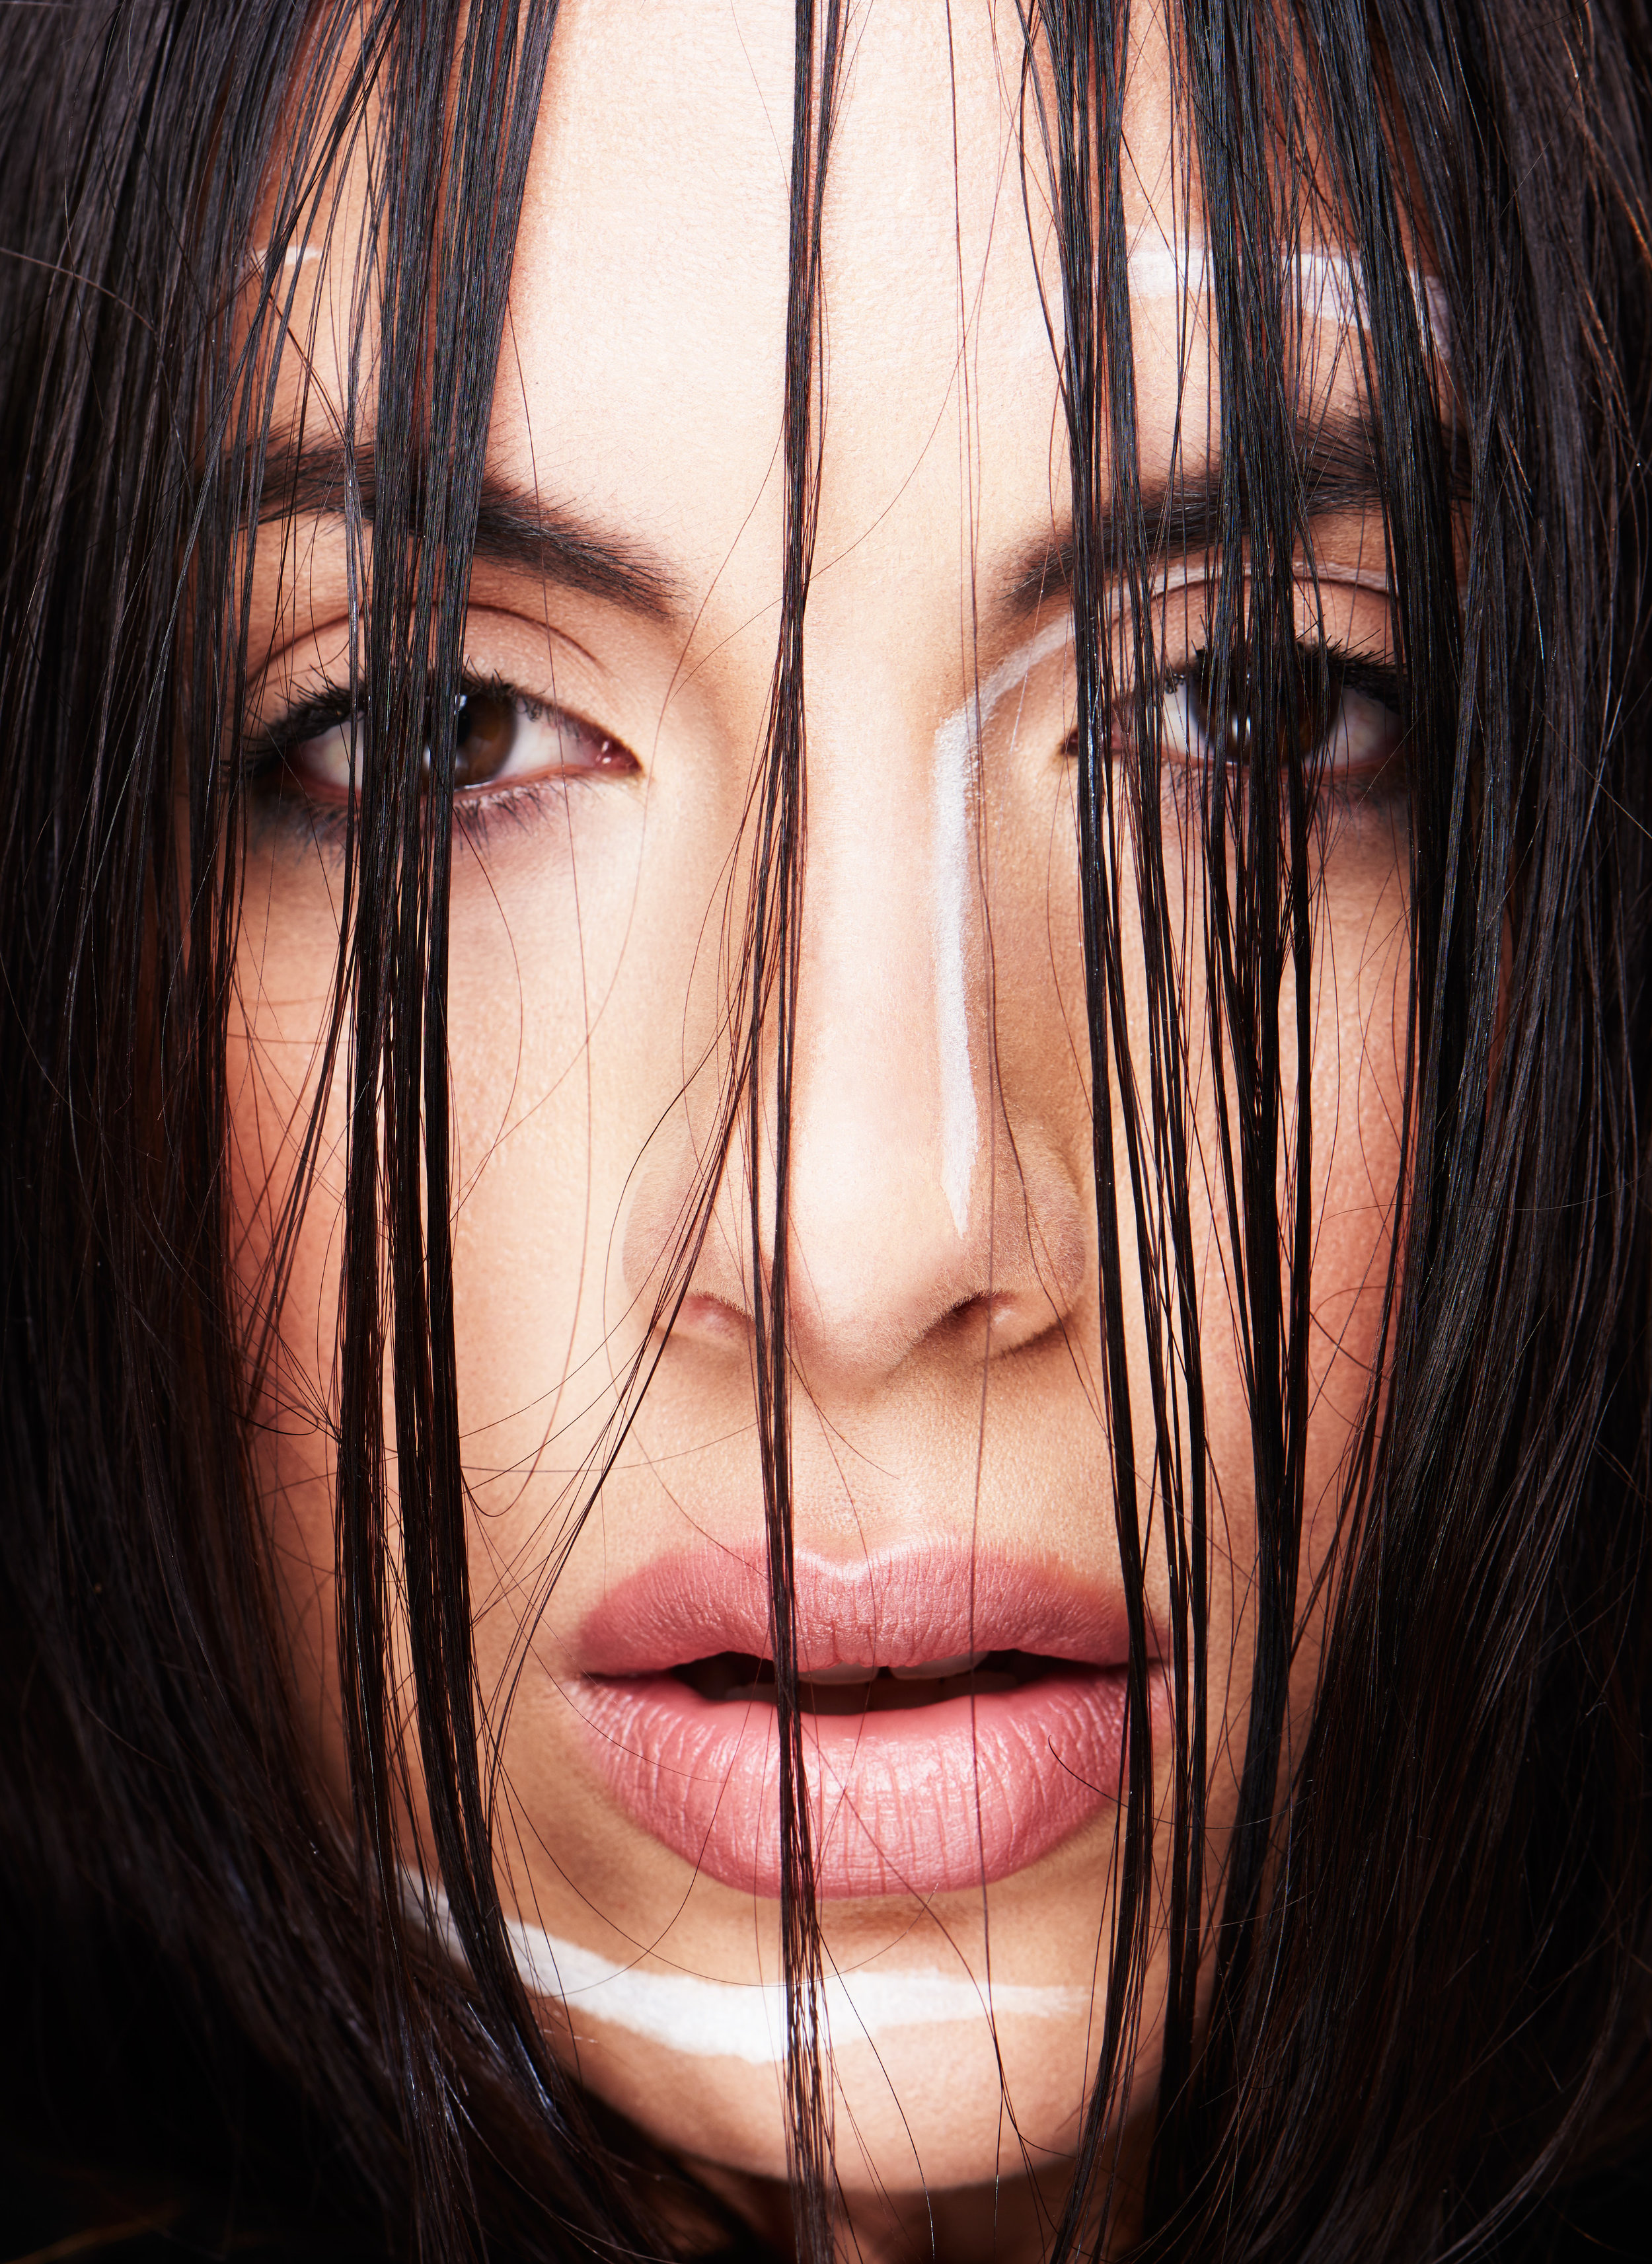 Nicole-Beauty1347 1.jpg